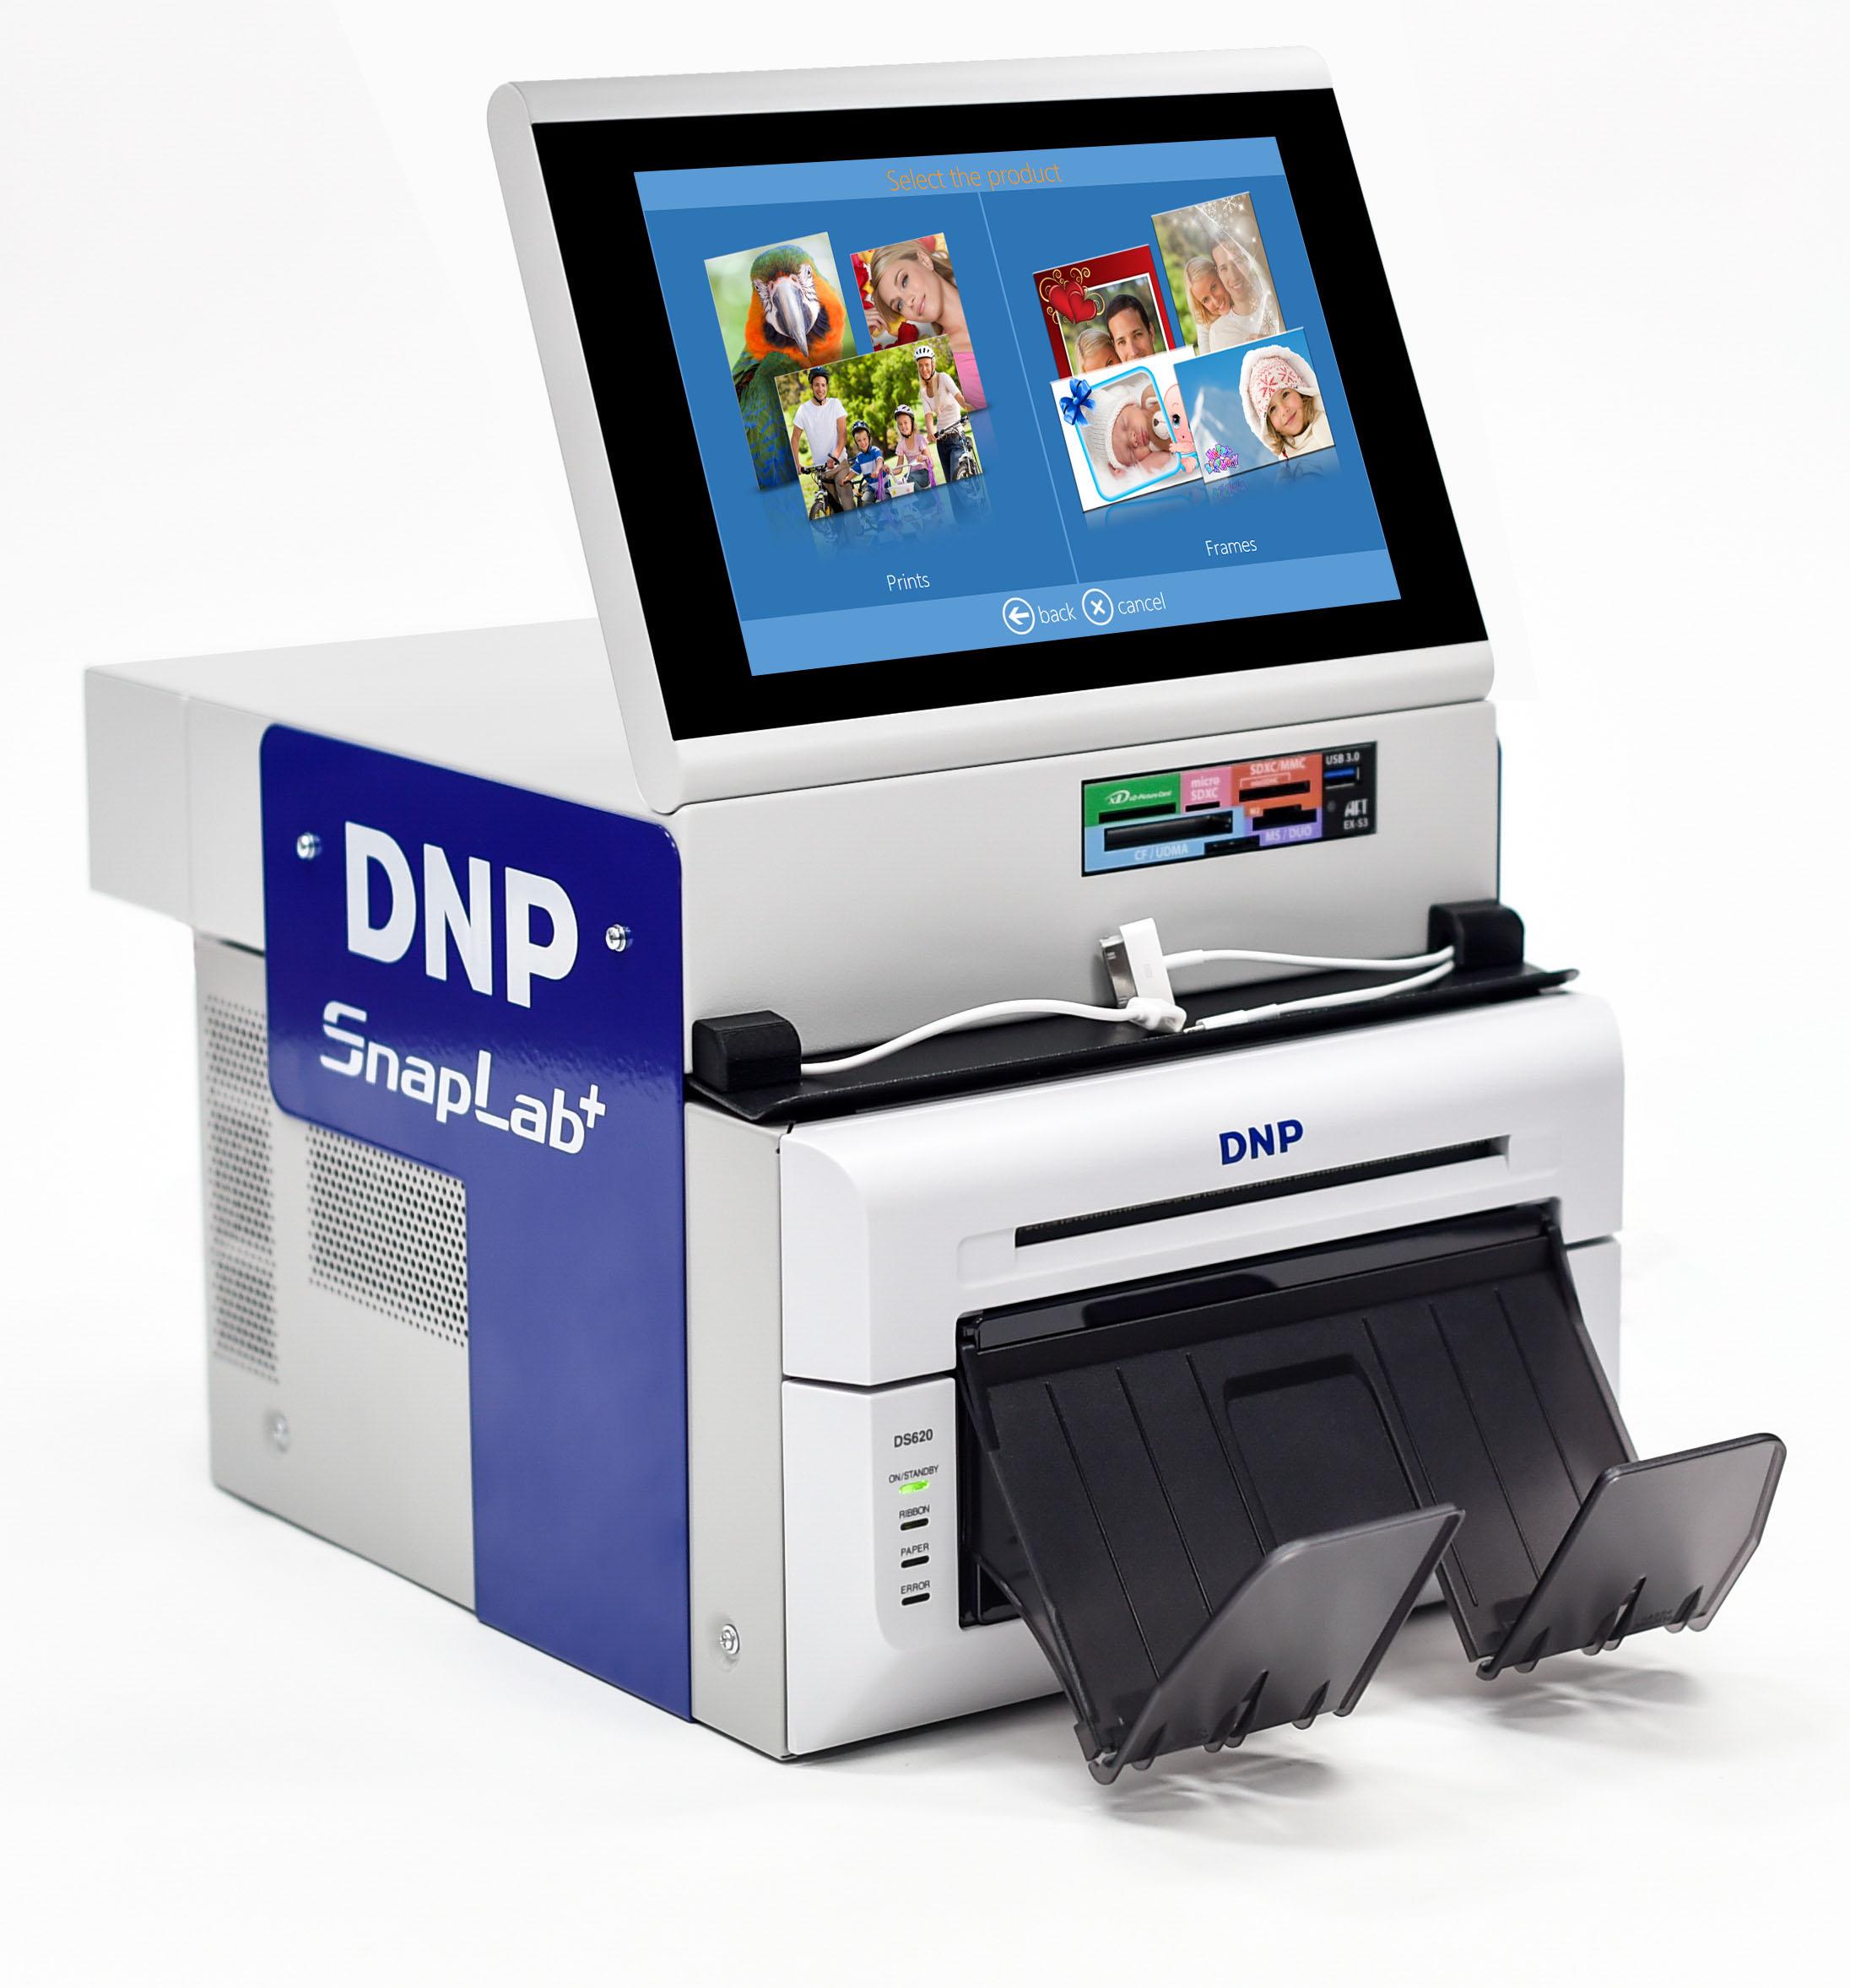 DNP SnapLab+ SL620A Compact Kiosk System (SL620A-Set)